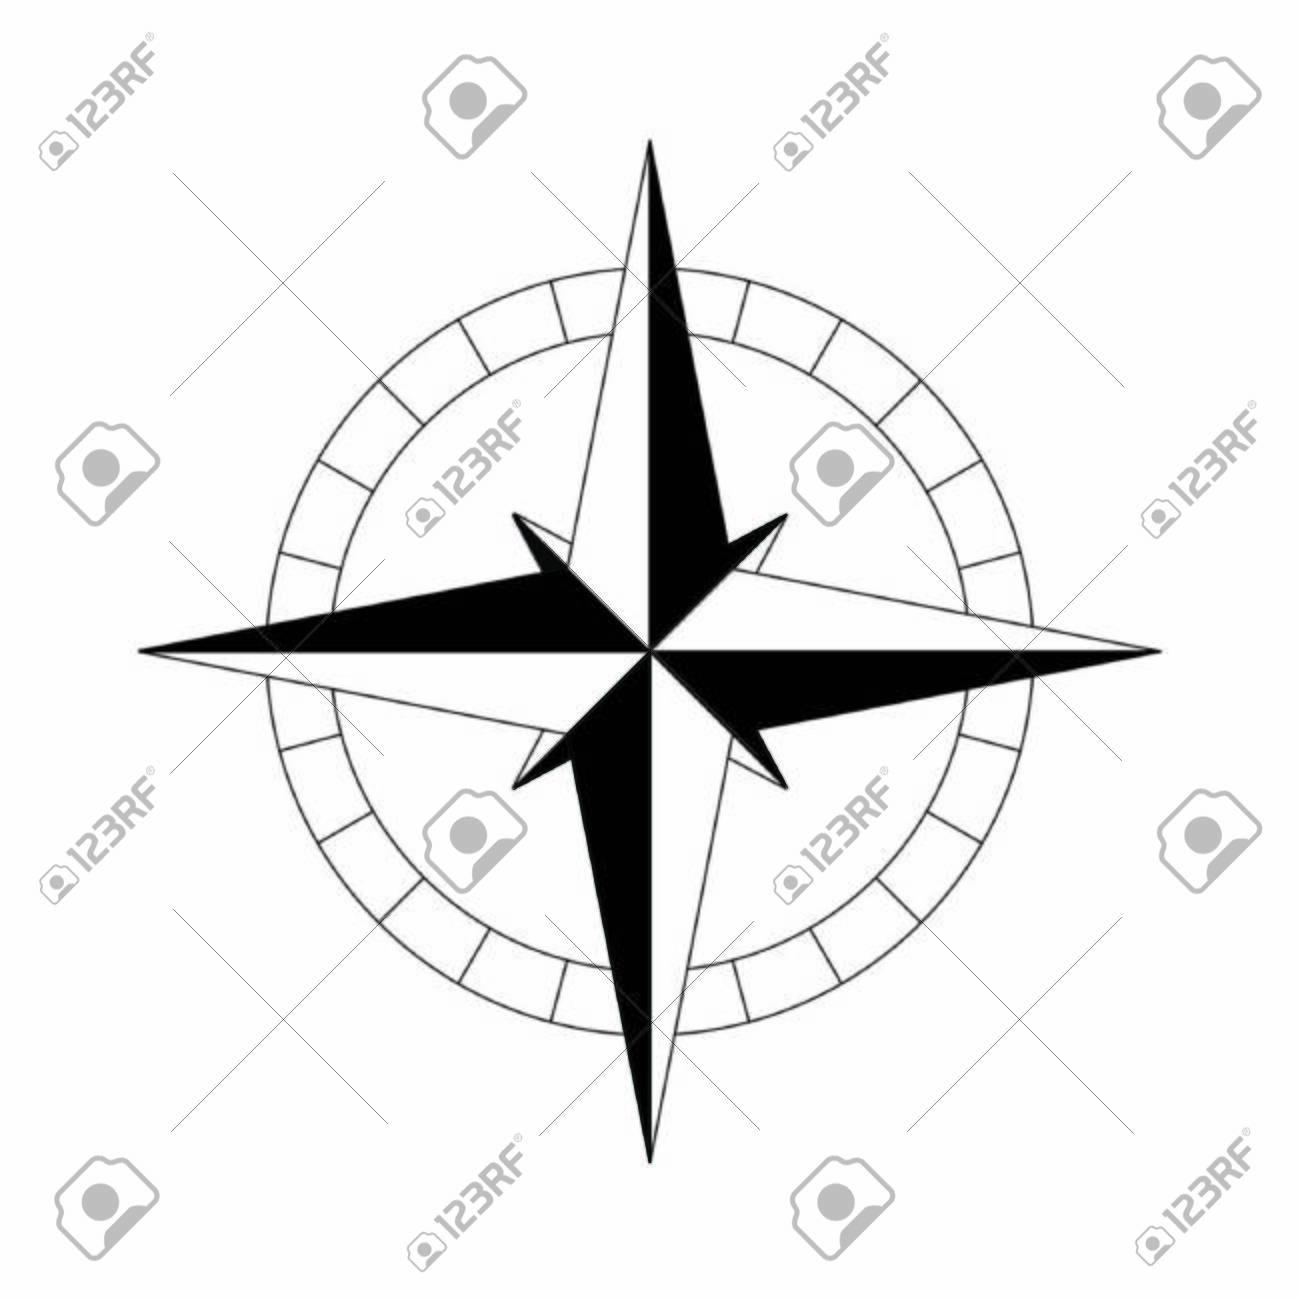 compass simple black icon. Vector illustration - 131545311